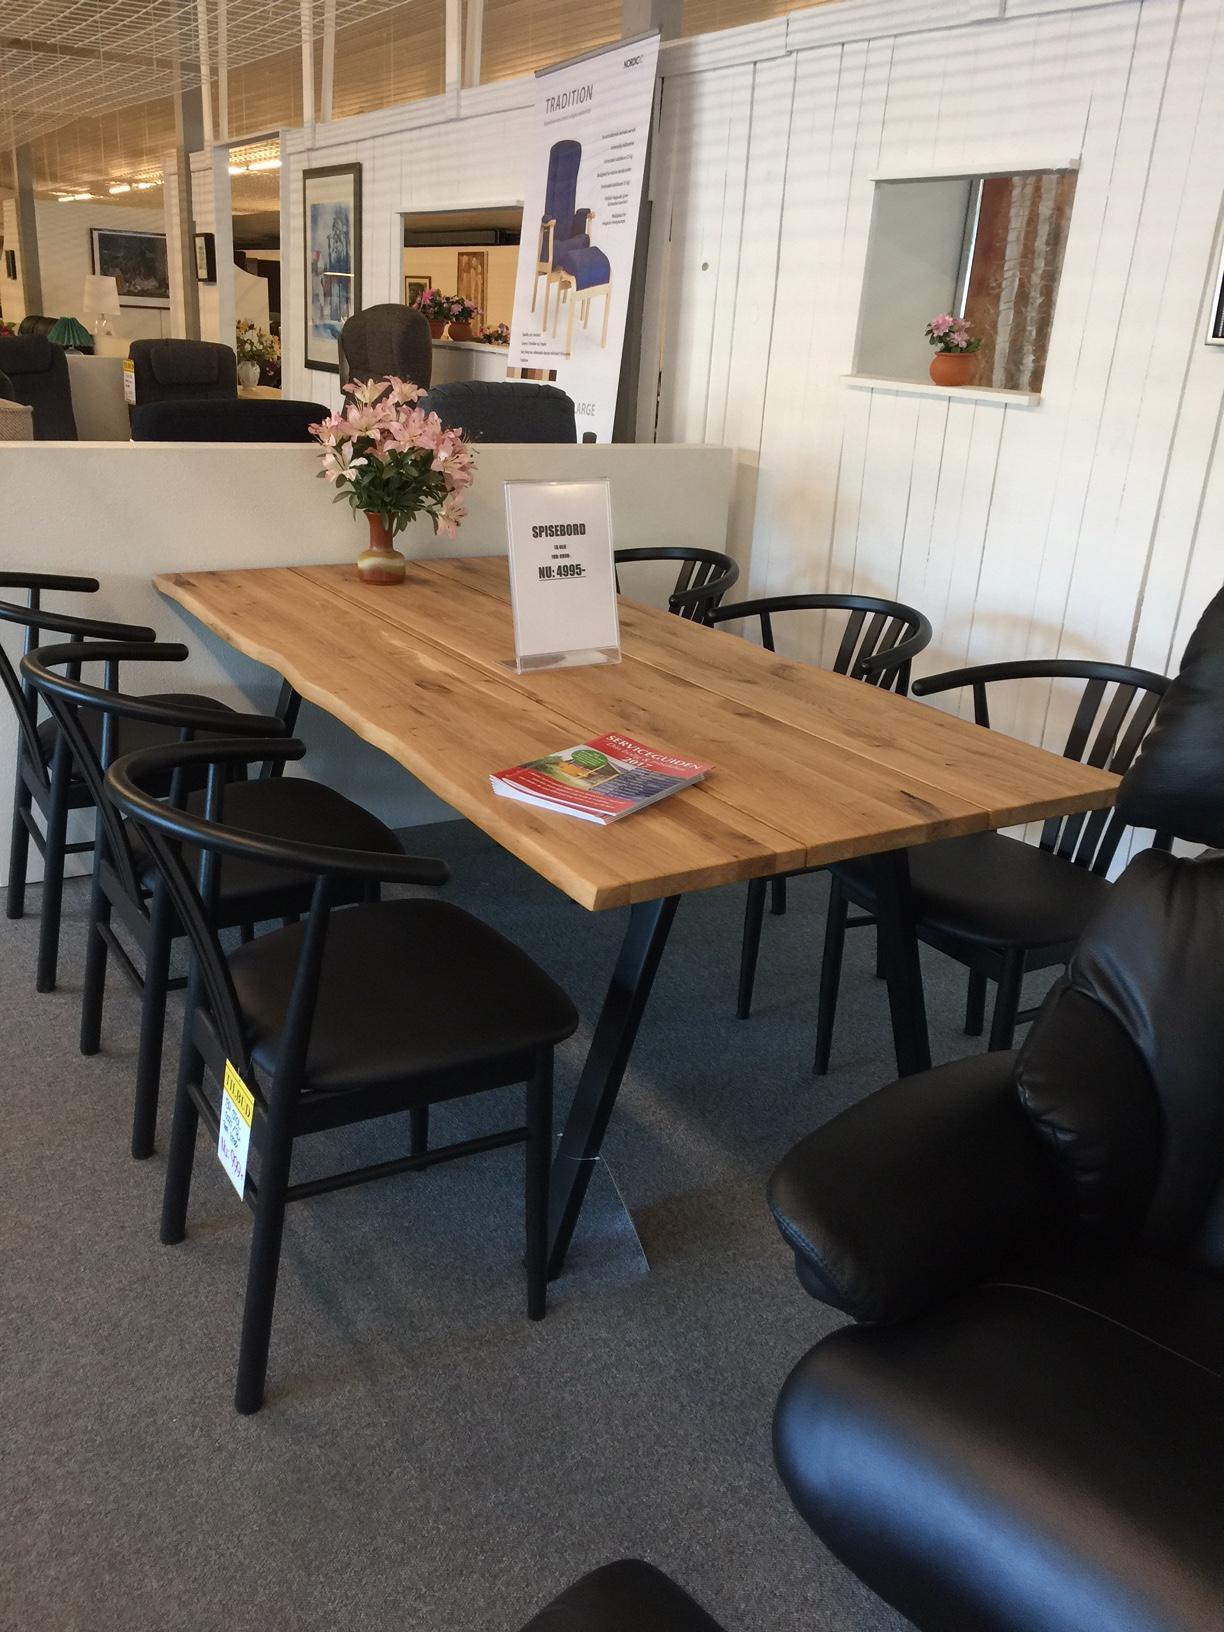 Pæn In2house har snuppet den første konkursberørte møbelbutik - Wood HR84